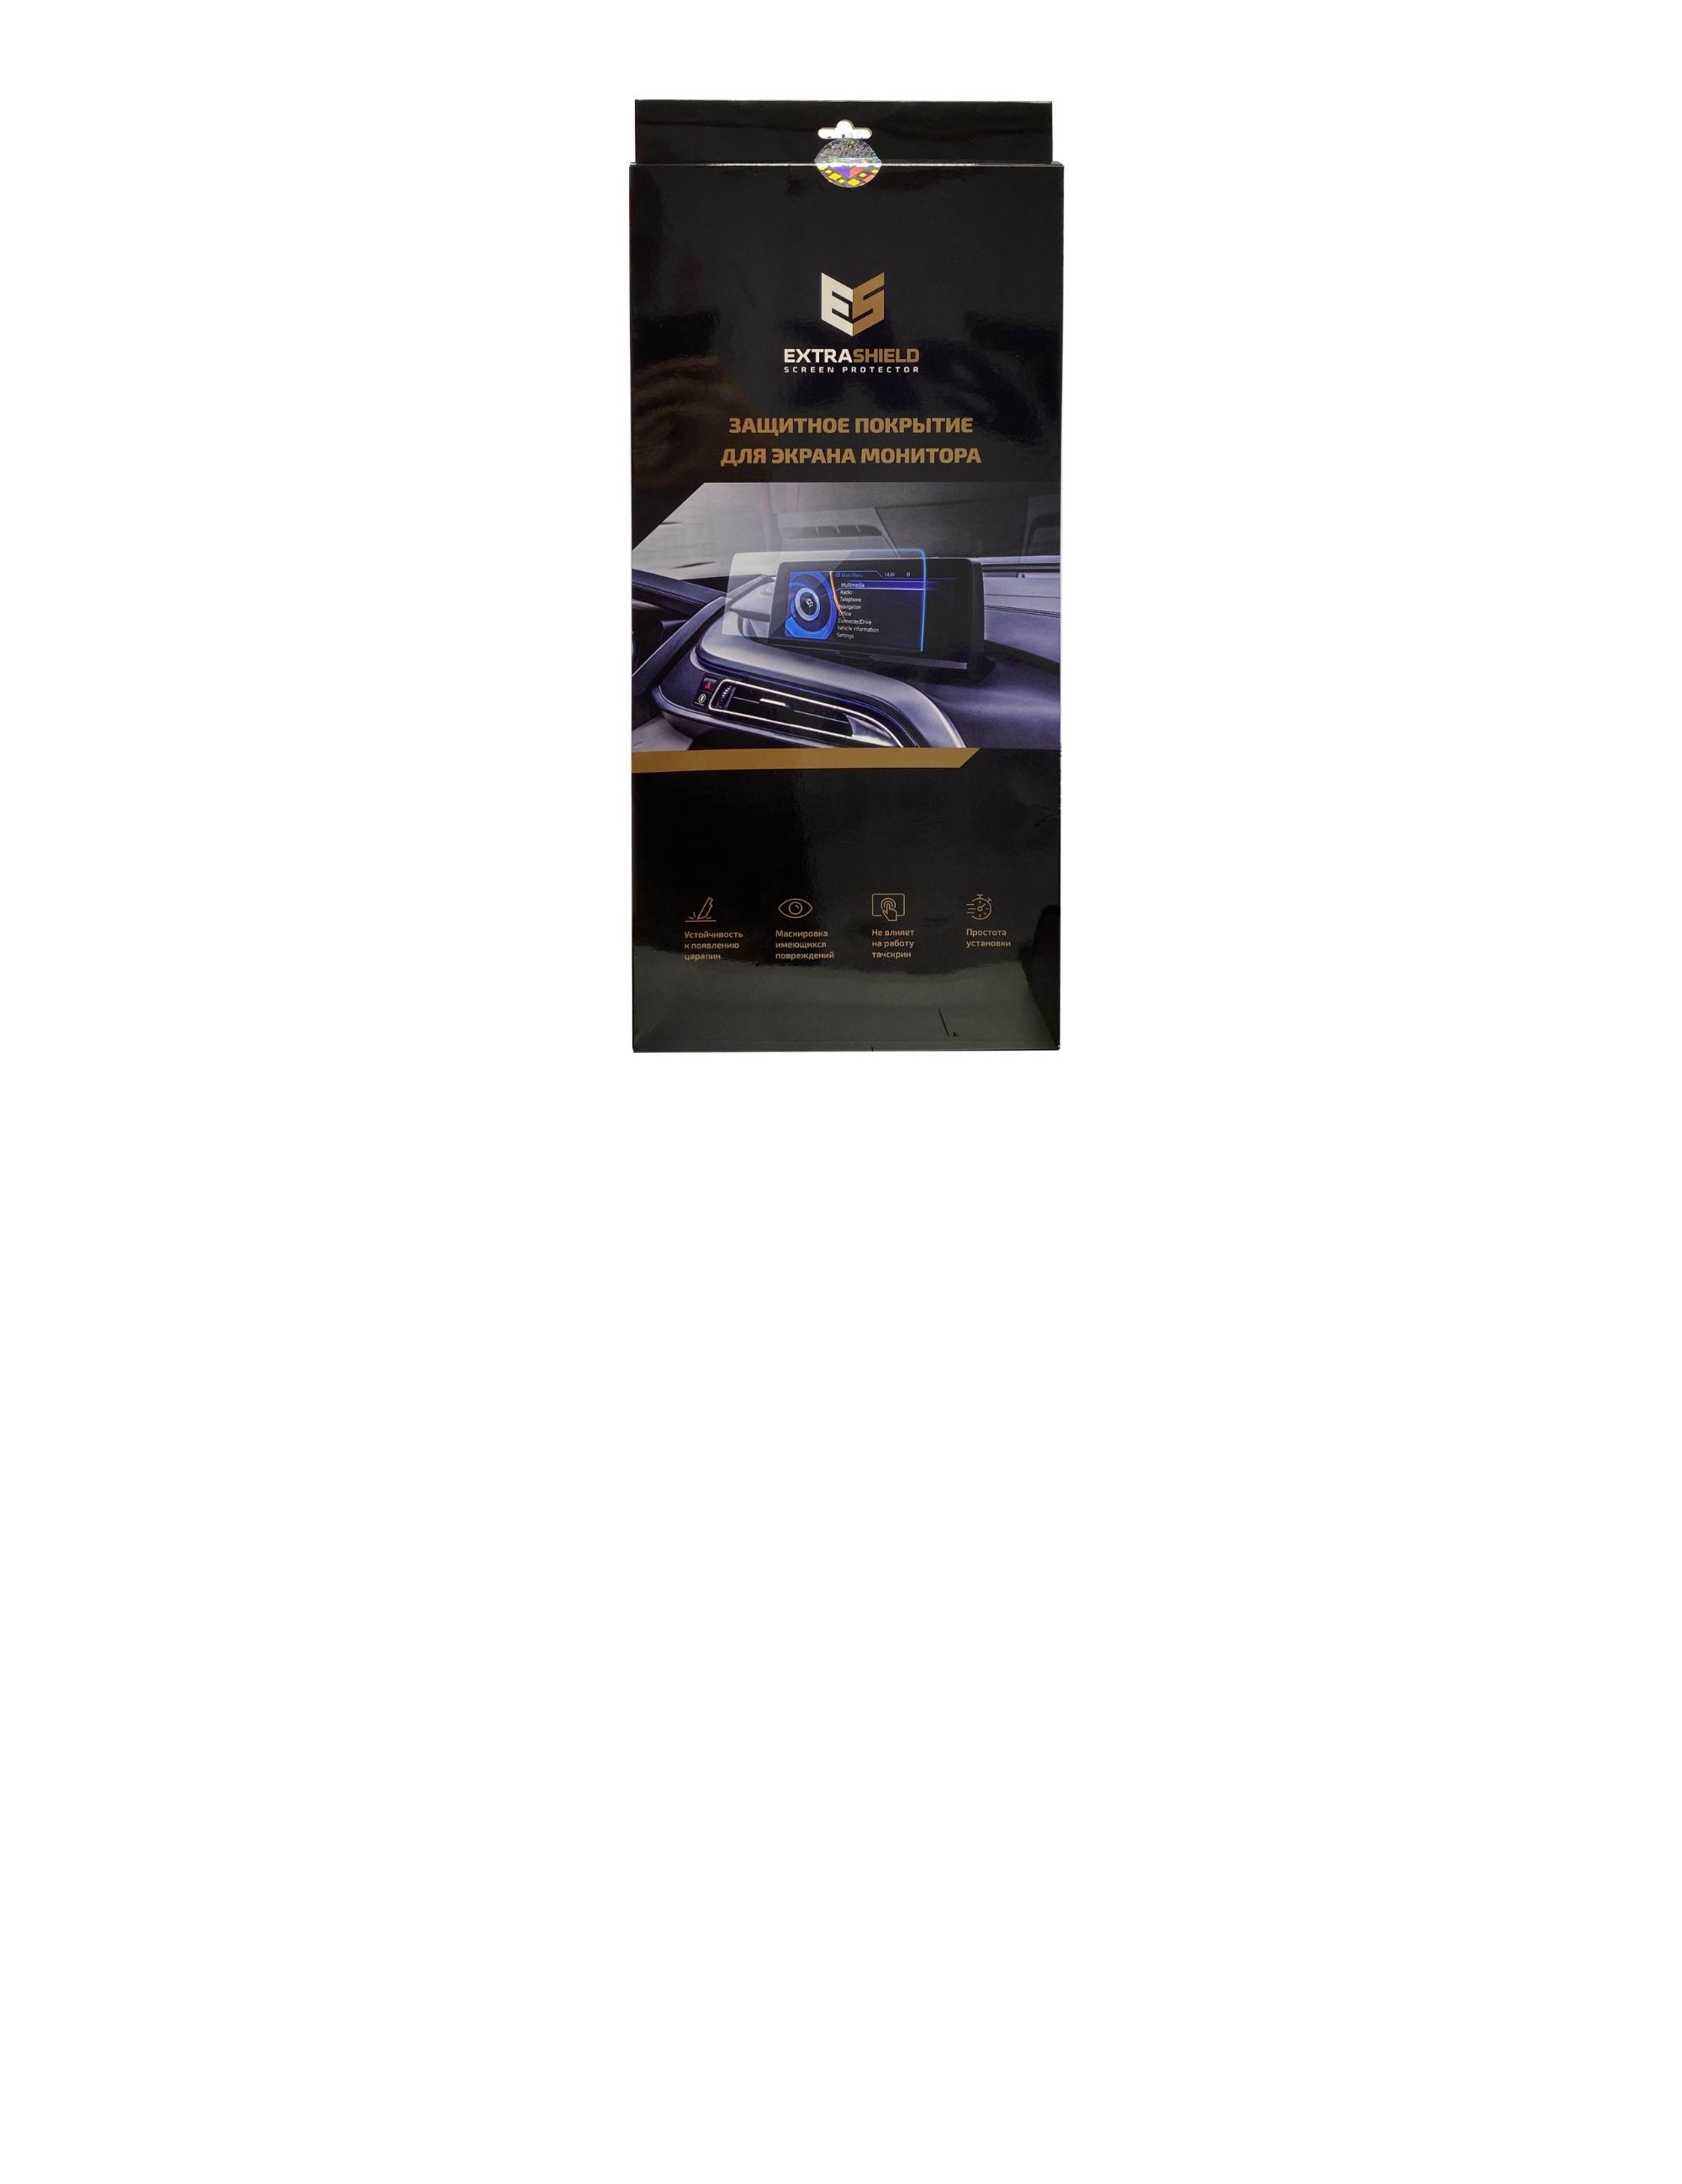 BMW X4 ( F26) 2014 - 2018 мультимедиа 6.5 Защитное стекло Глянец